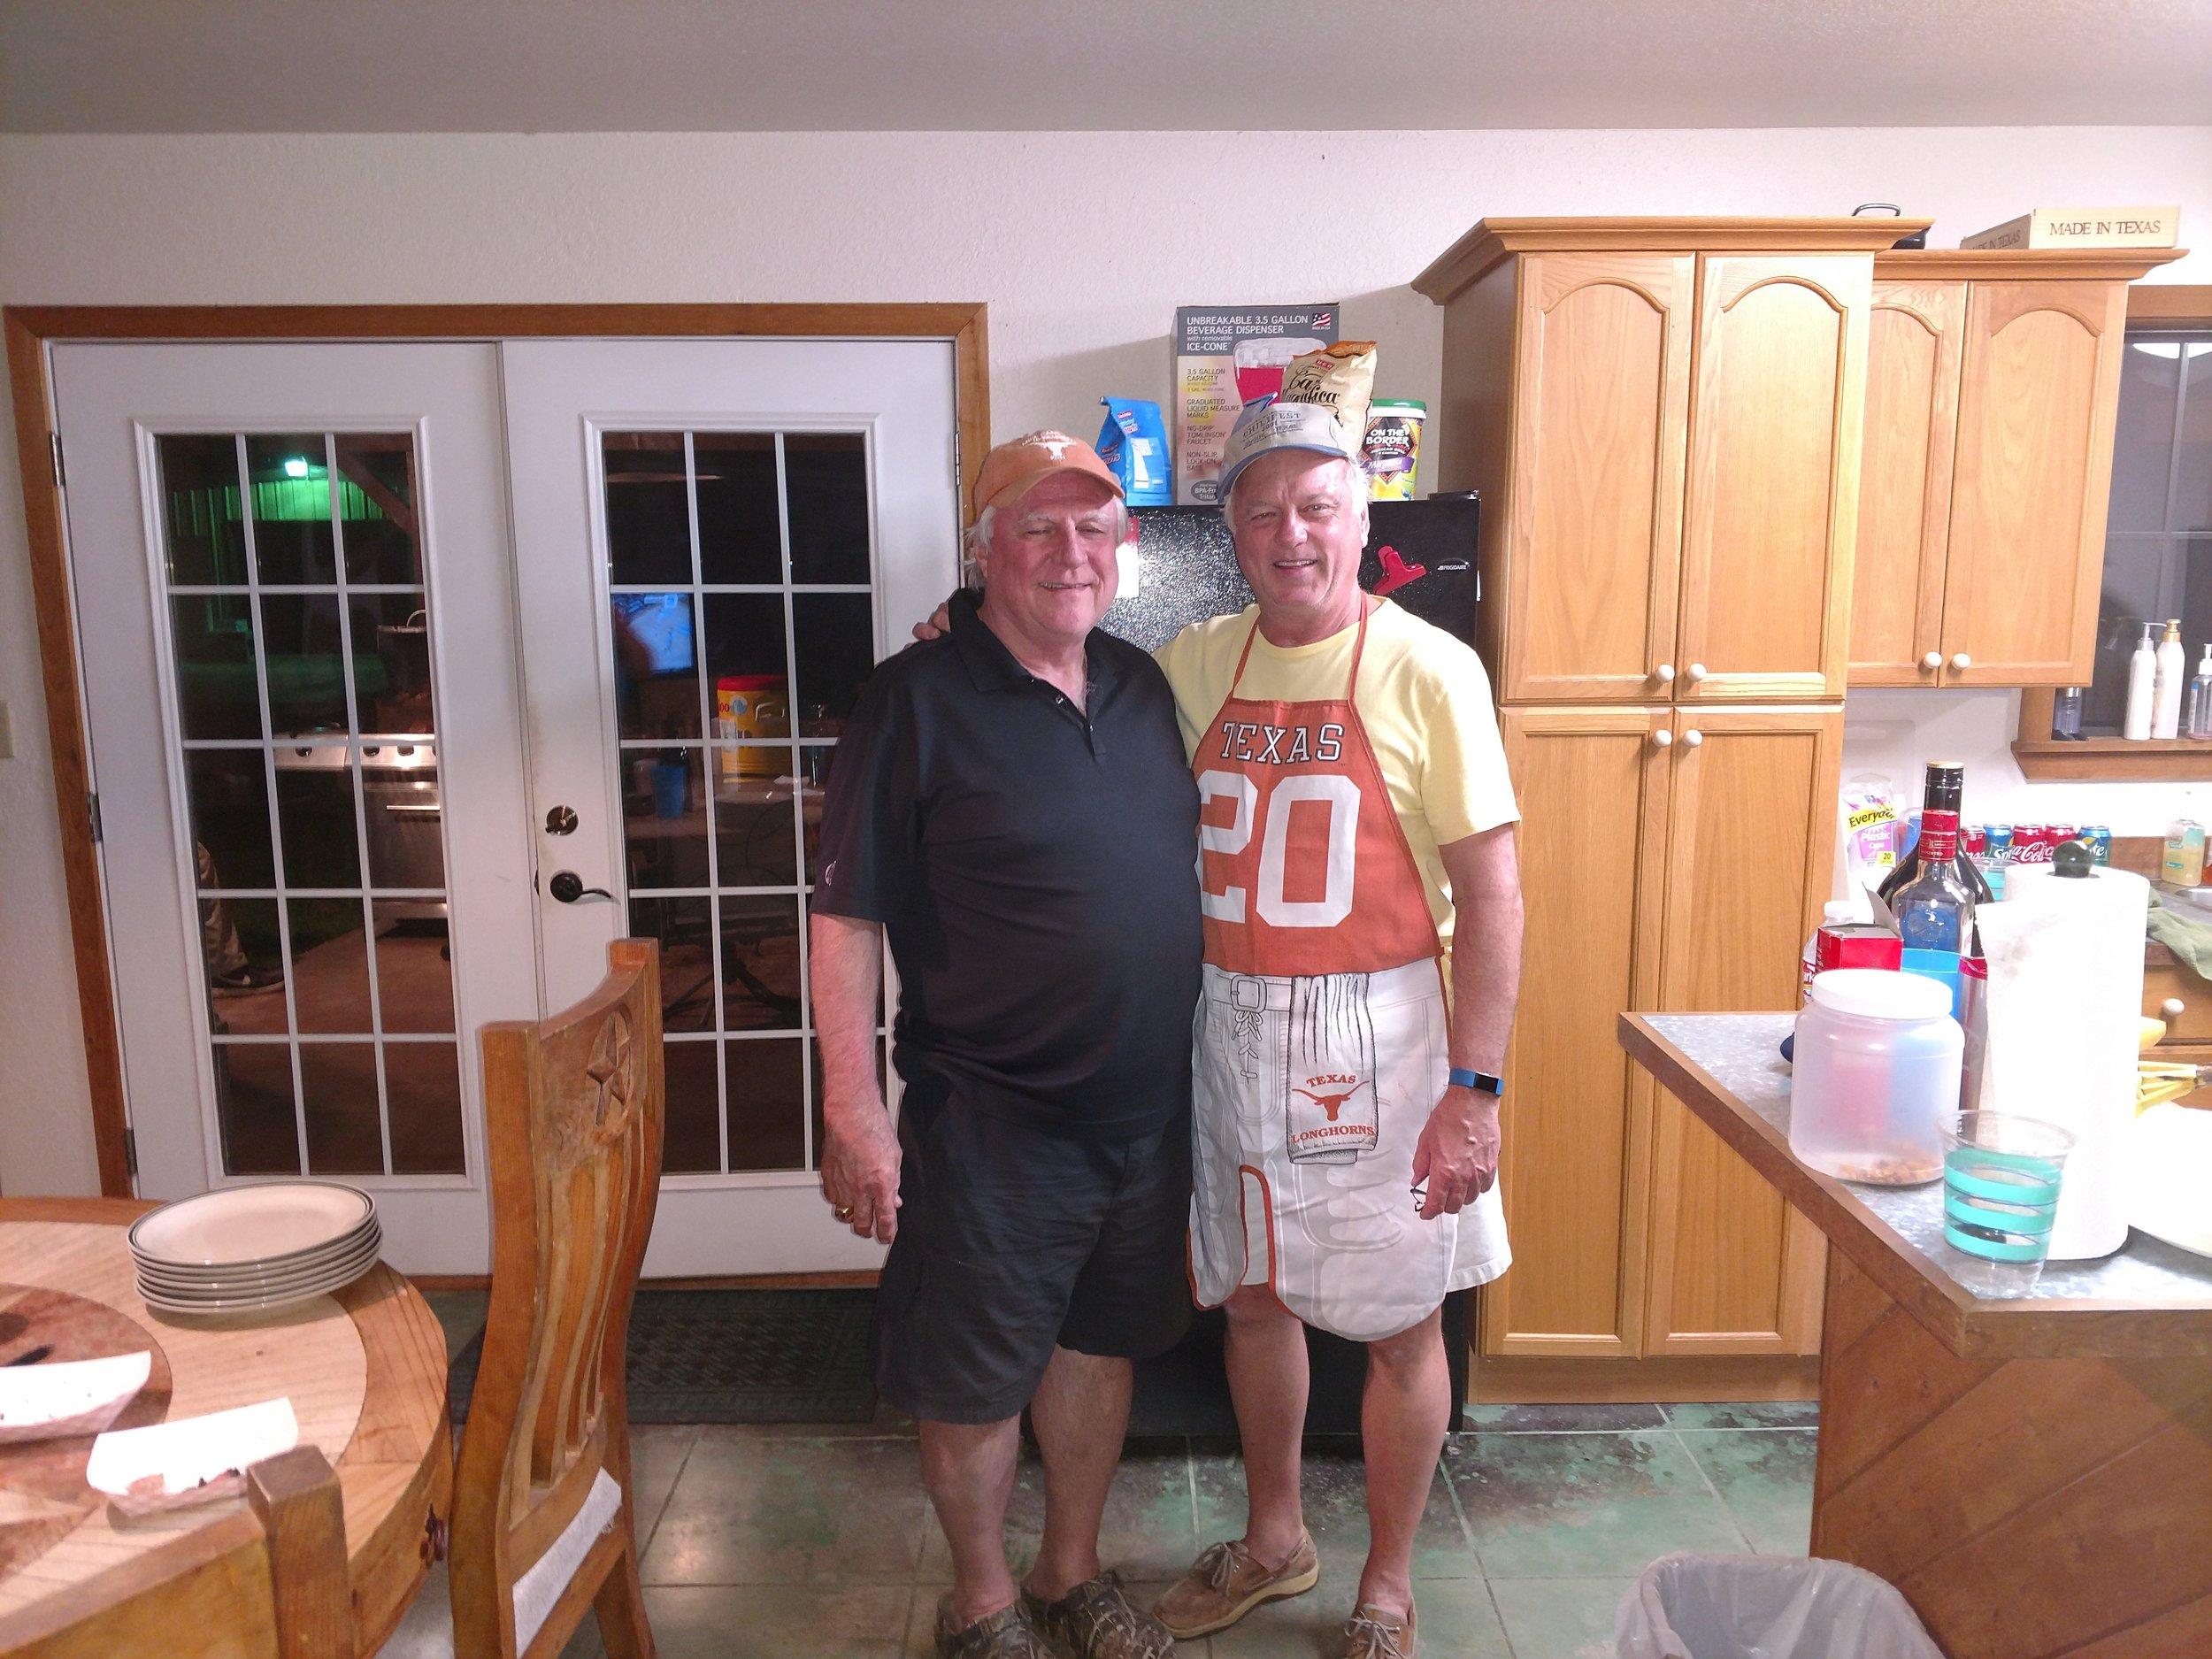 Pat Kelly and Steve Cumley